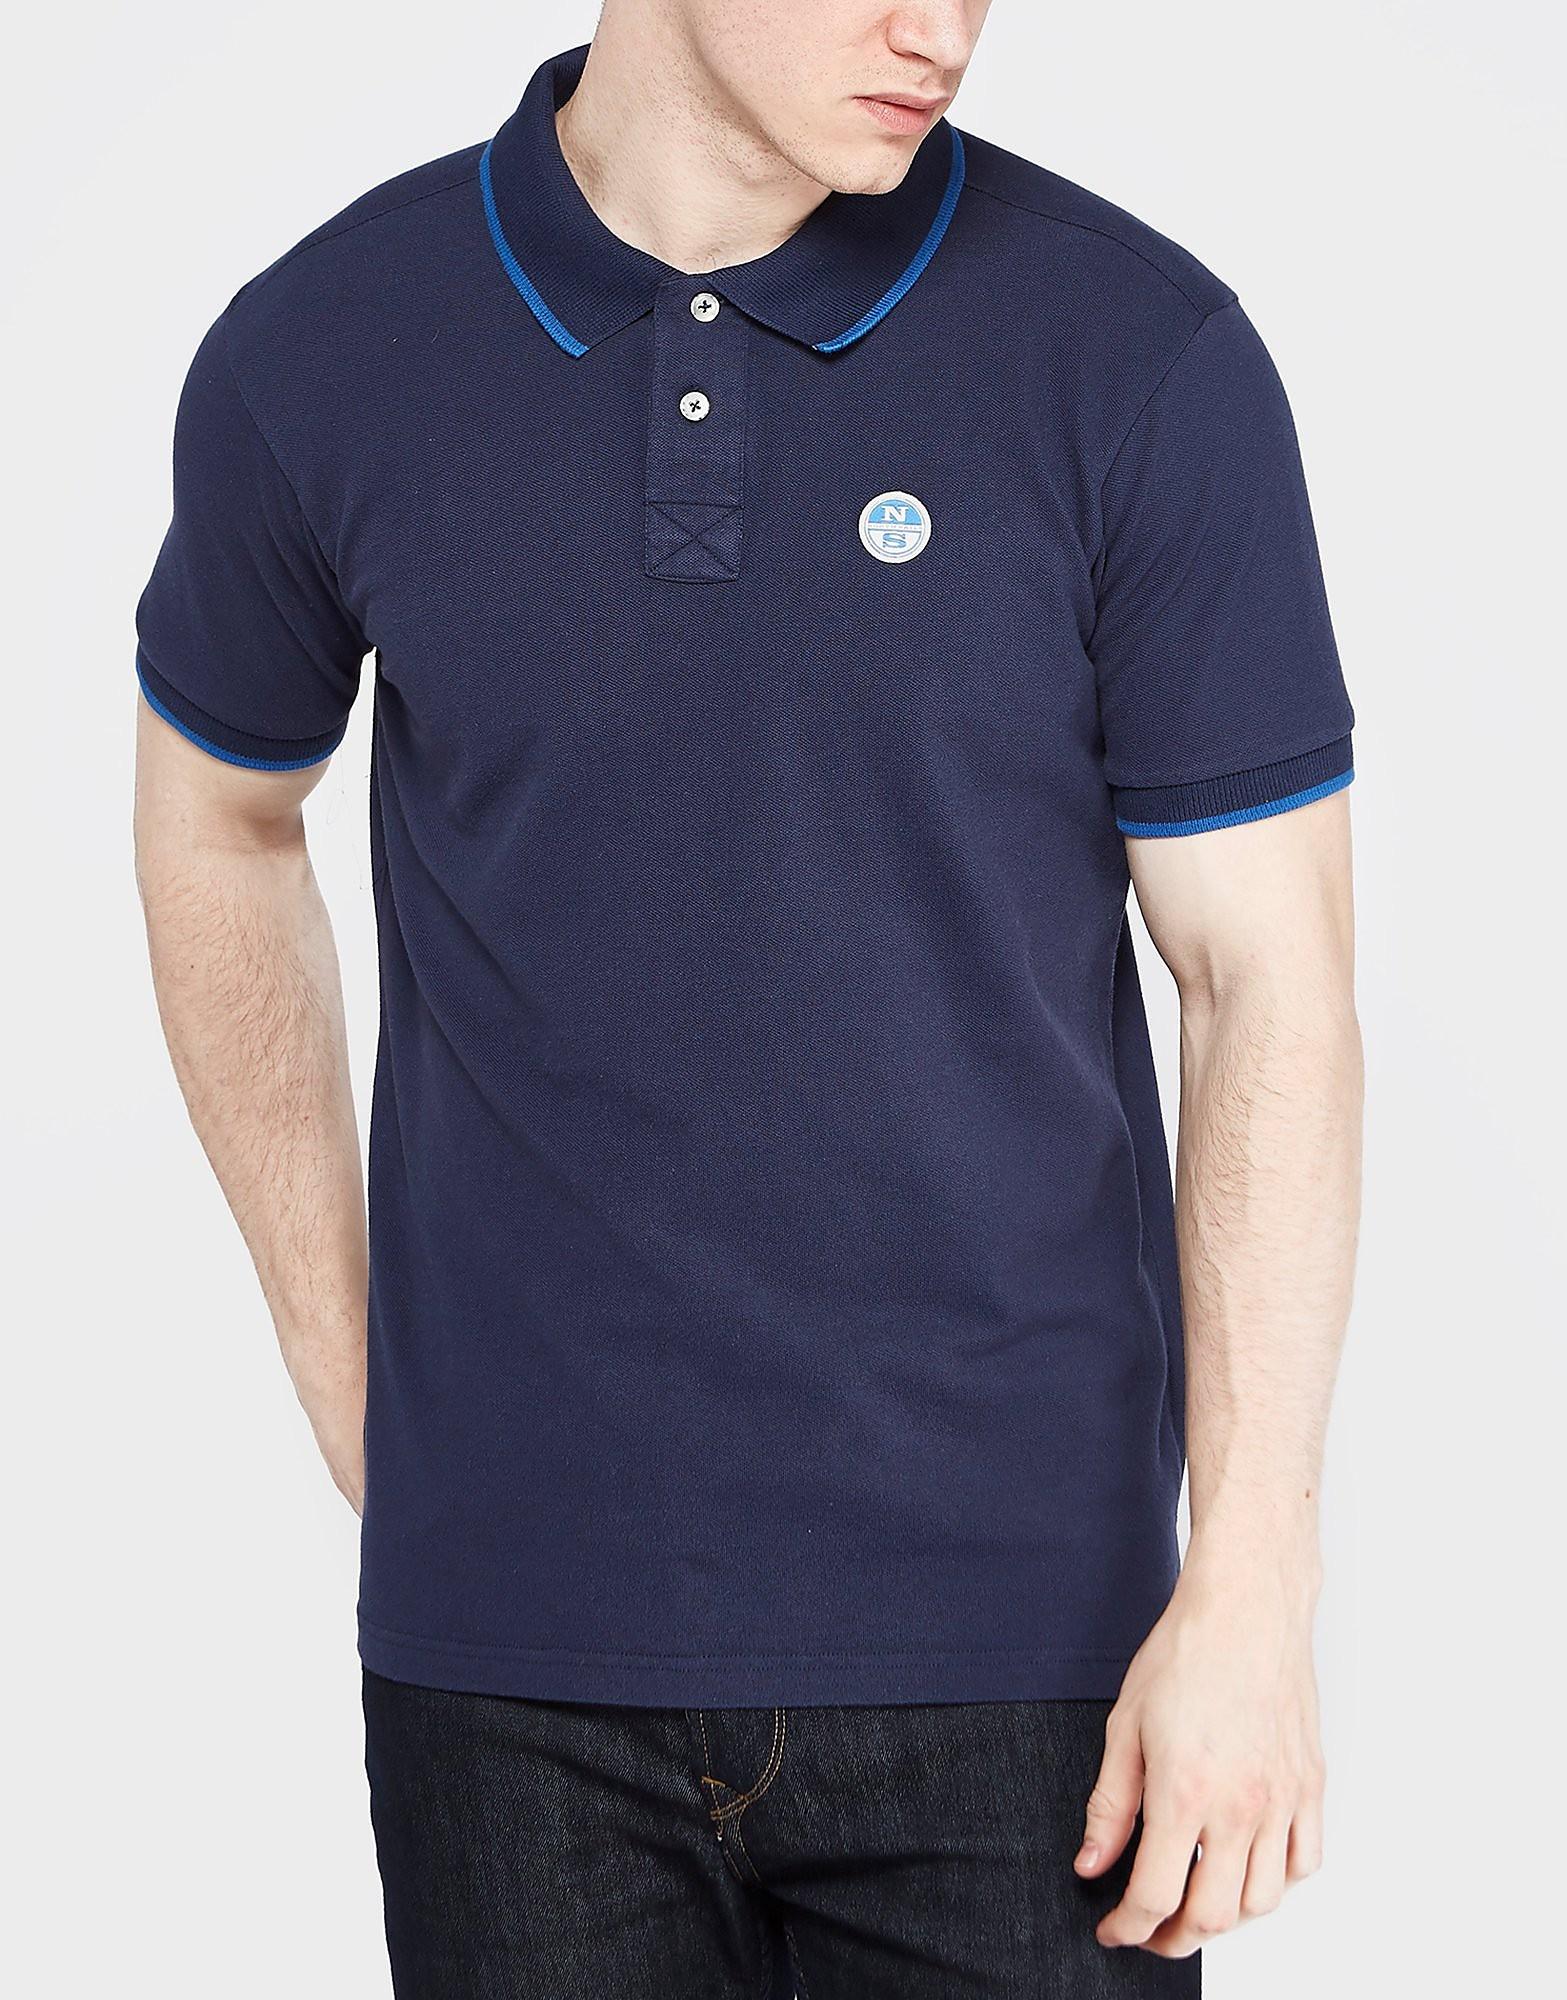 NORTH SAILS Pique Tipped Polo Shirt